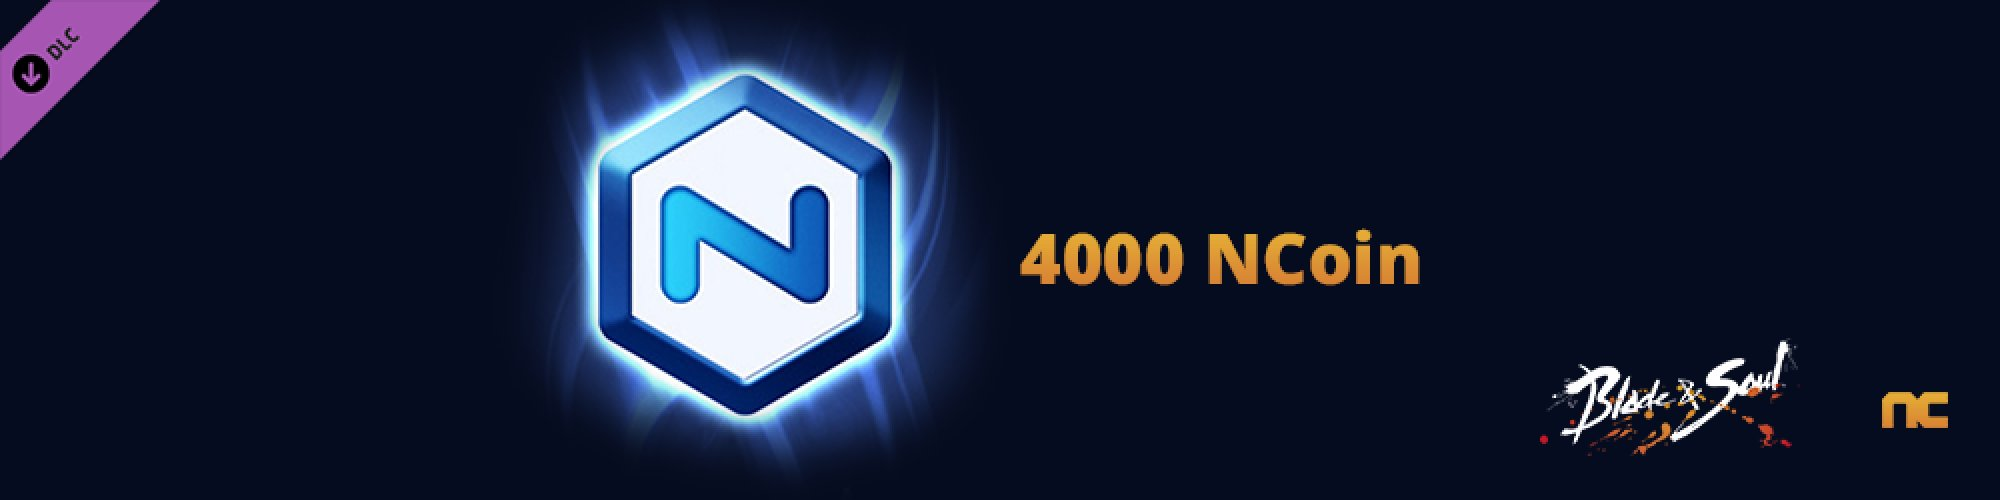 NCoin 4000 banner